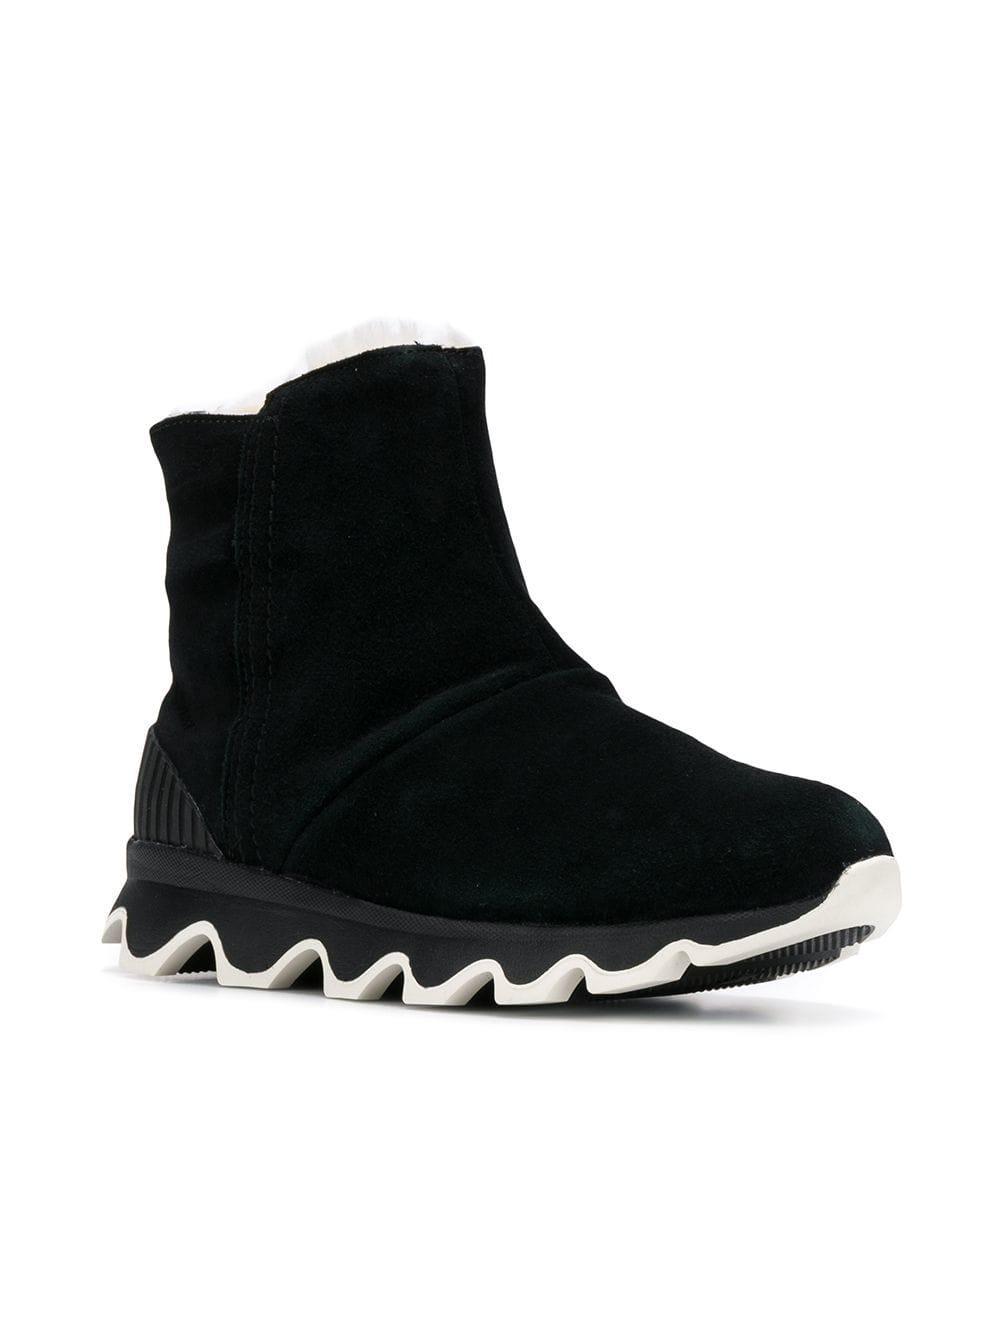 650b59172362 Sorel - Black Ridged Platform Boots - Lyst. View fullscreen